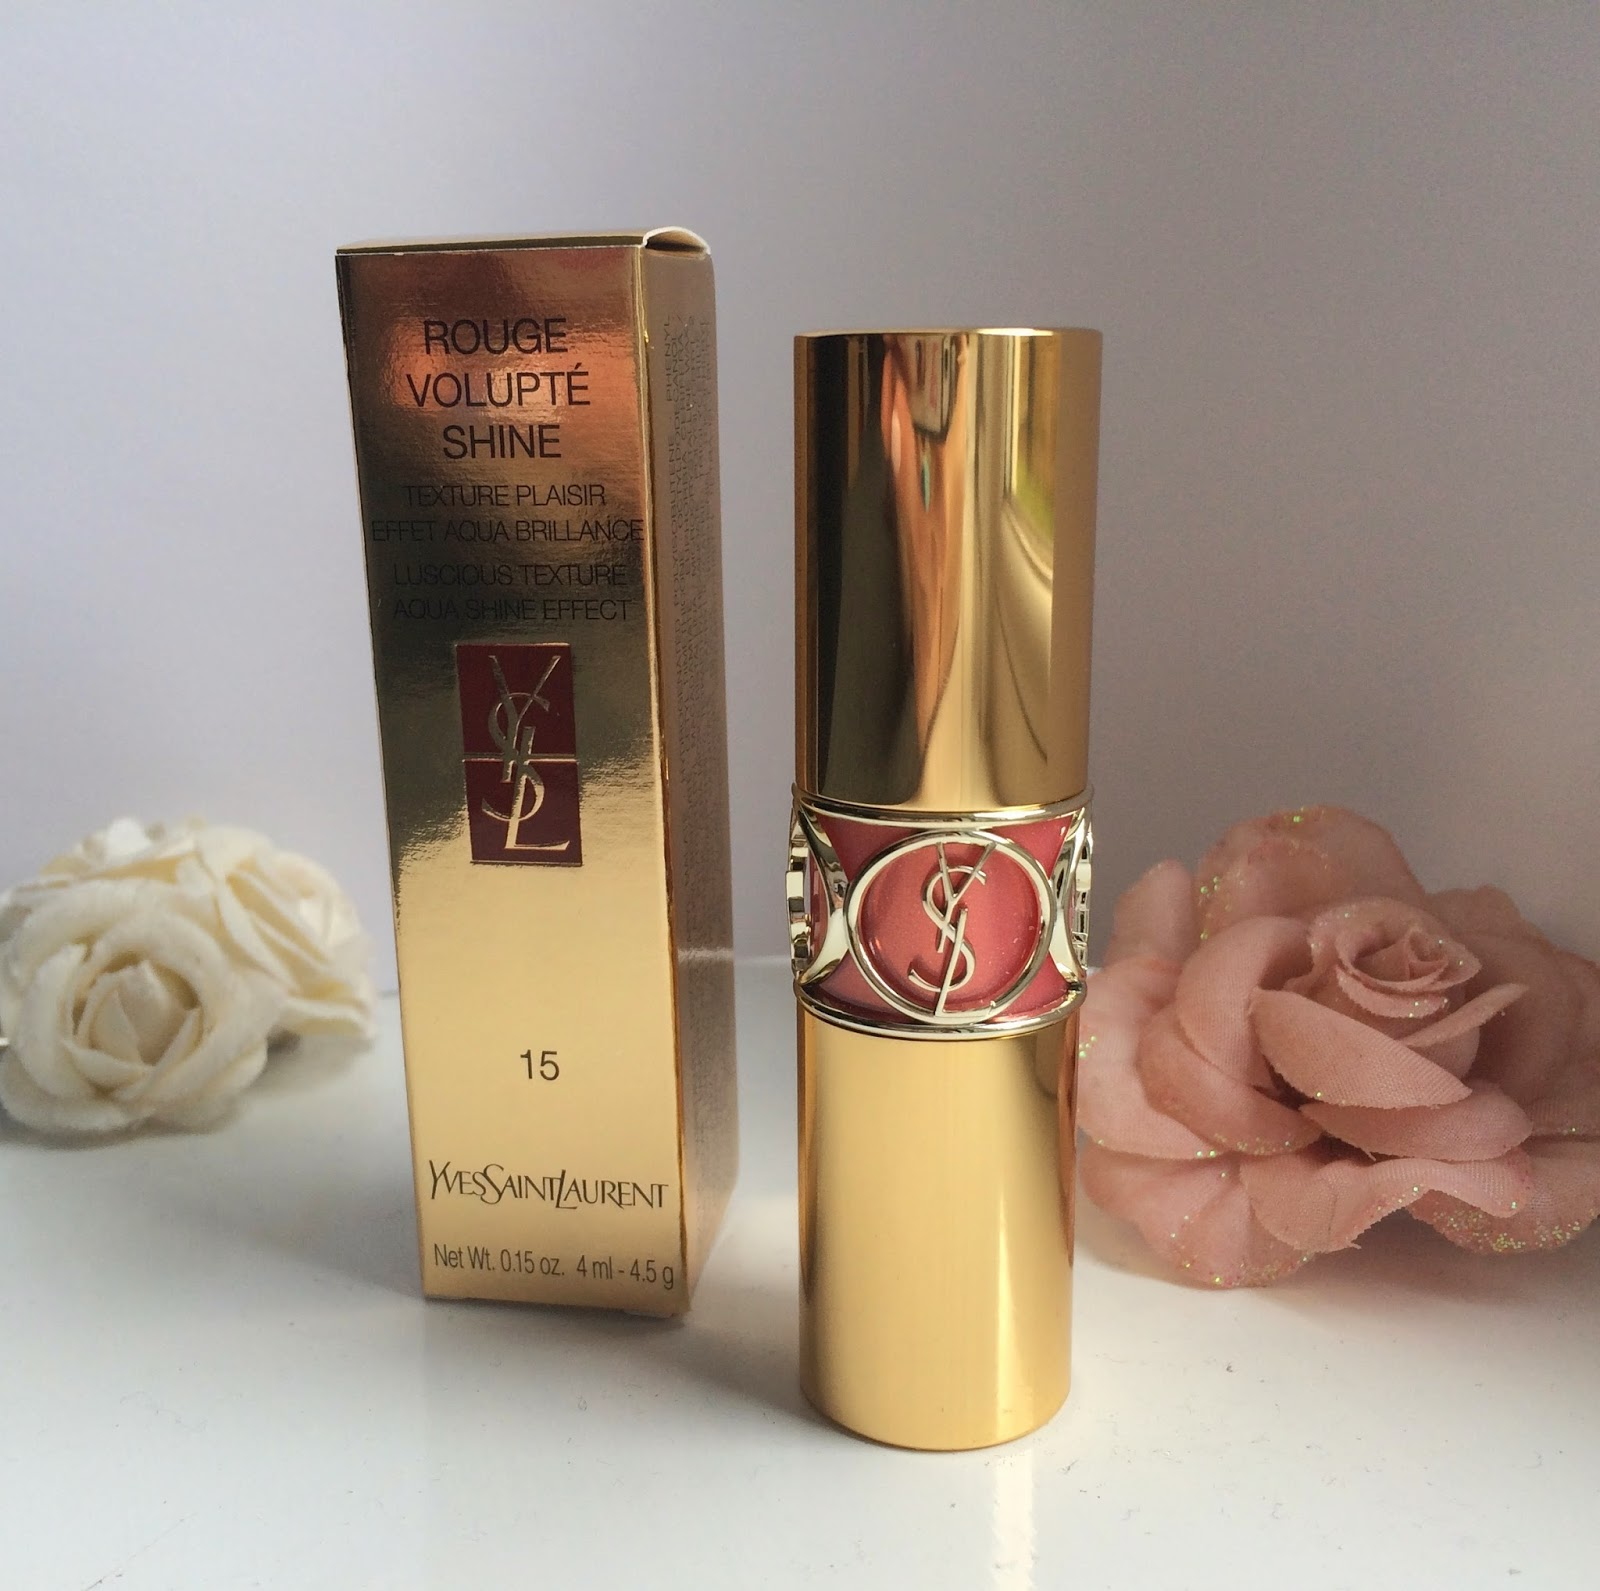 ysl-Rouge-Volupte-Shine-lipstick-15-Corail-Intuitive